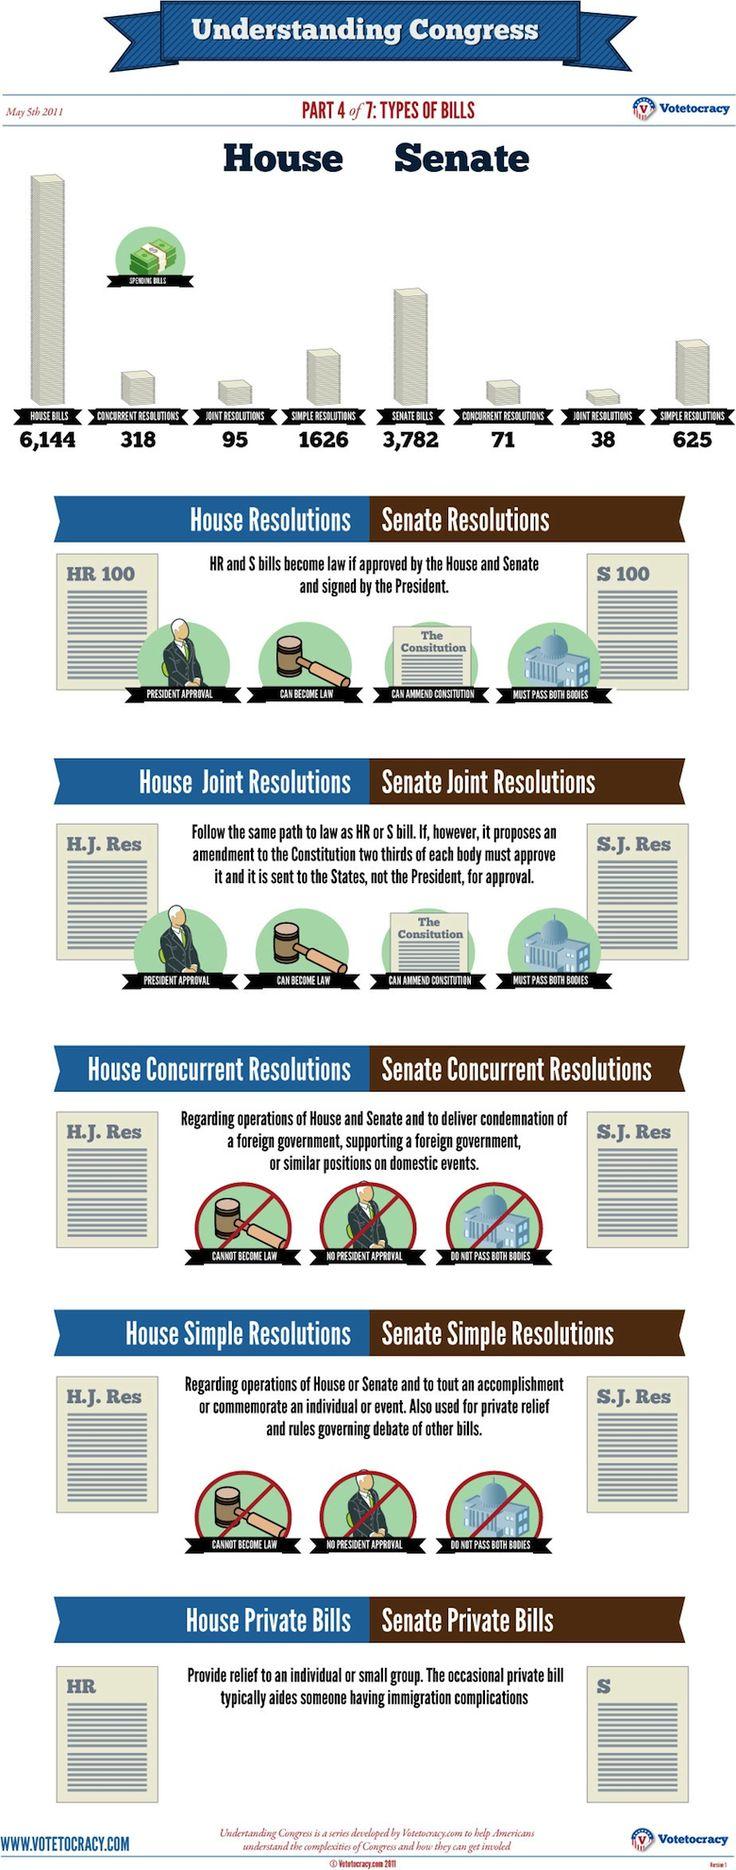 Types of Bills